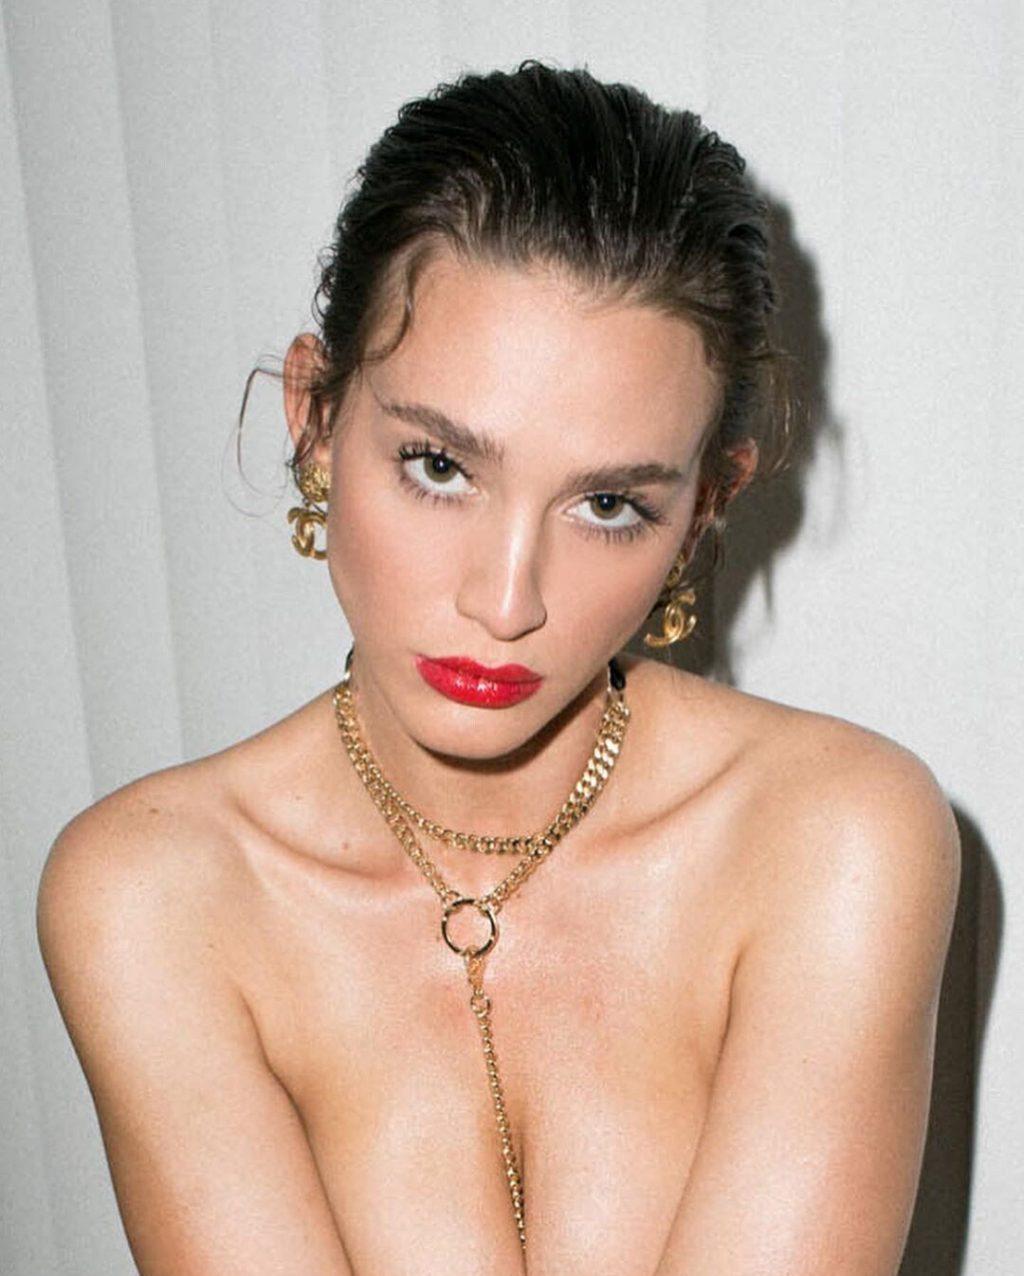 Jordyn Johnson Nude Sexy Thefappeningblog Com 86 1024x1276